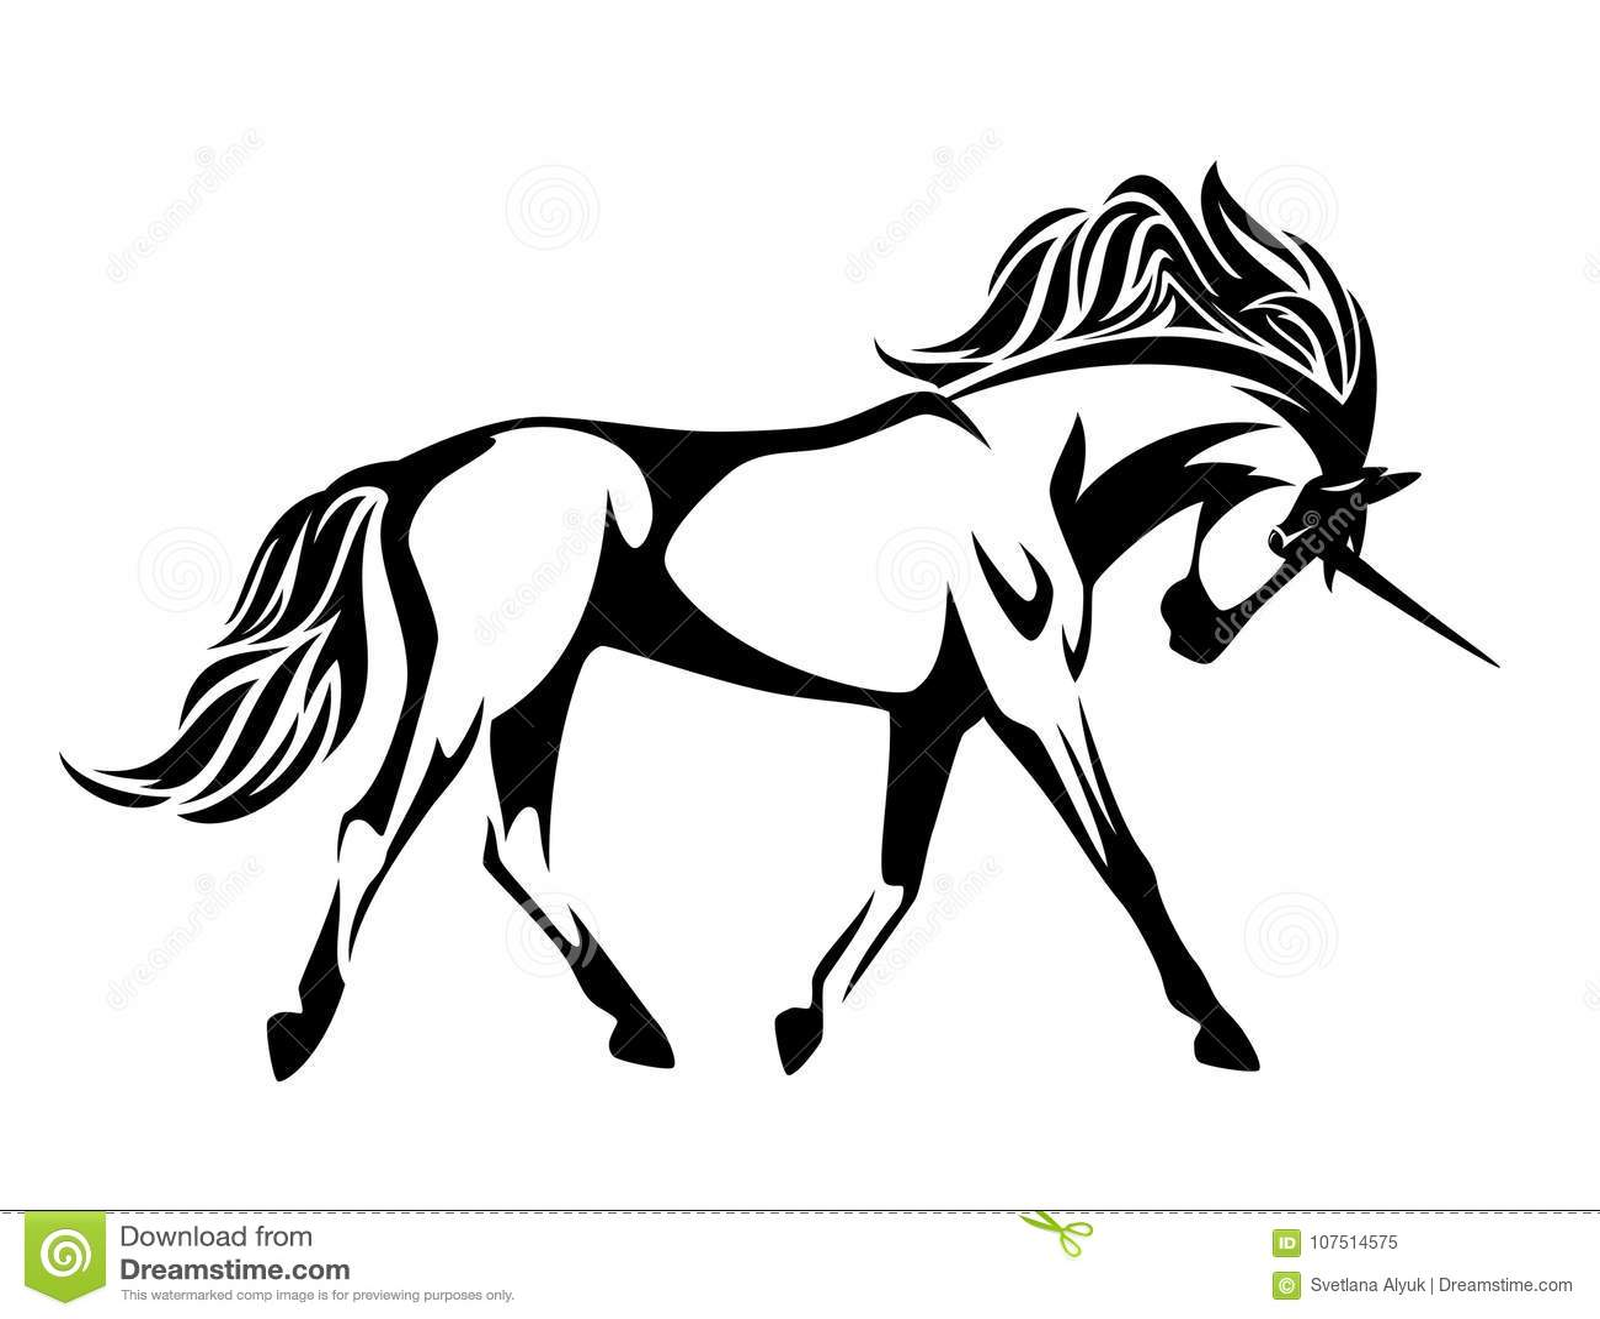 Running Unicorn Horse Vector Design Stock Vector